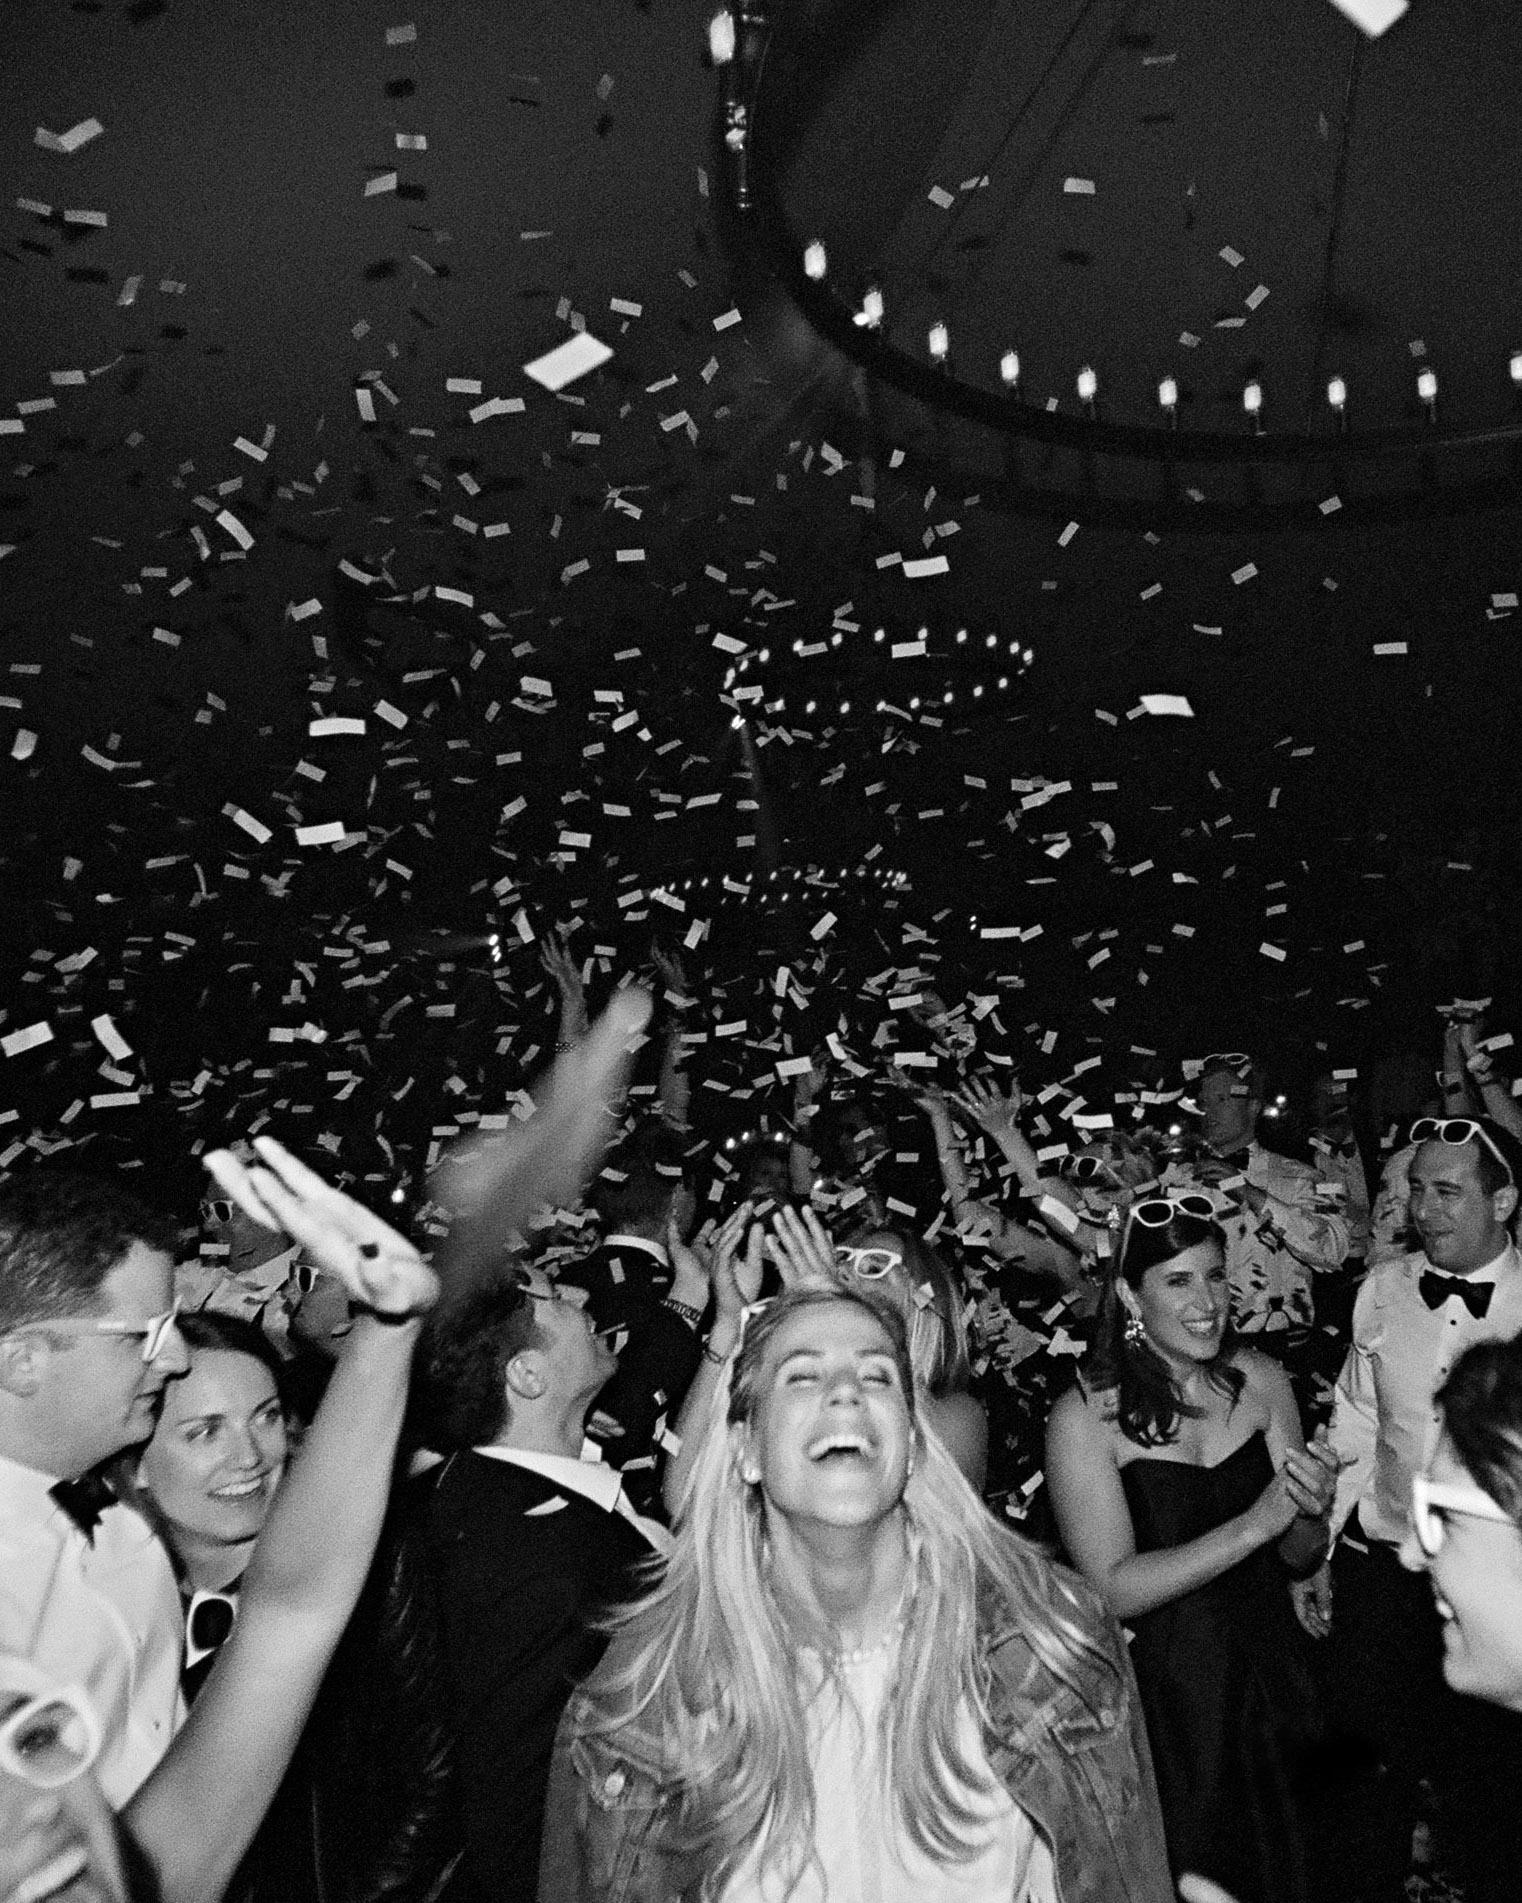 whitney zach wedding guests dancing confetti